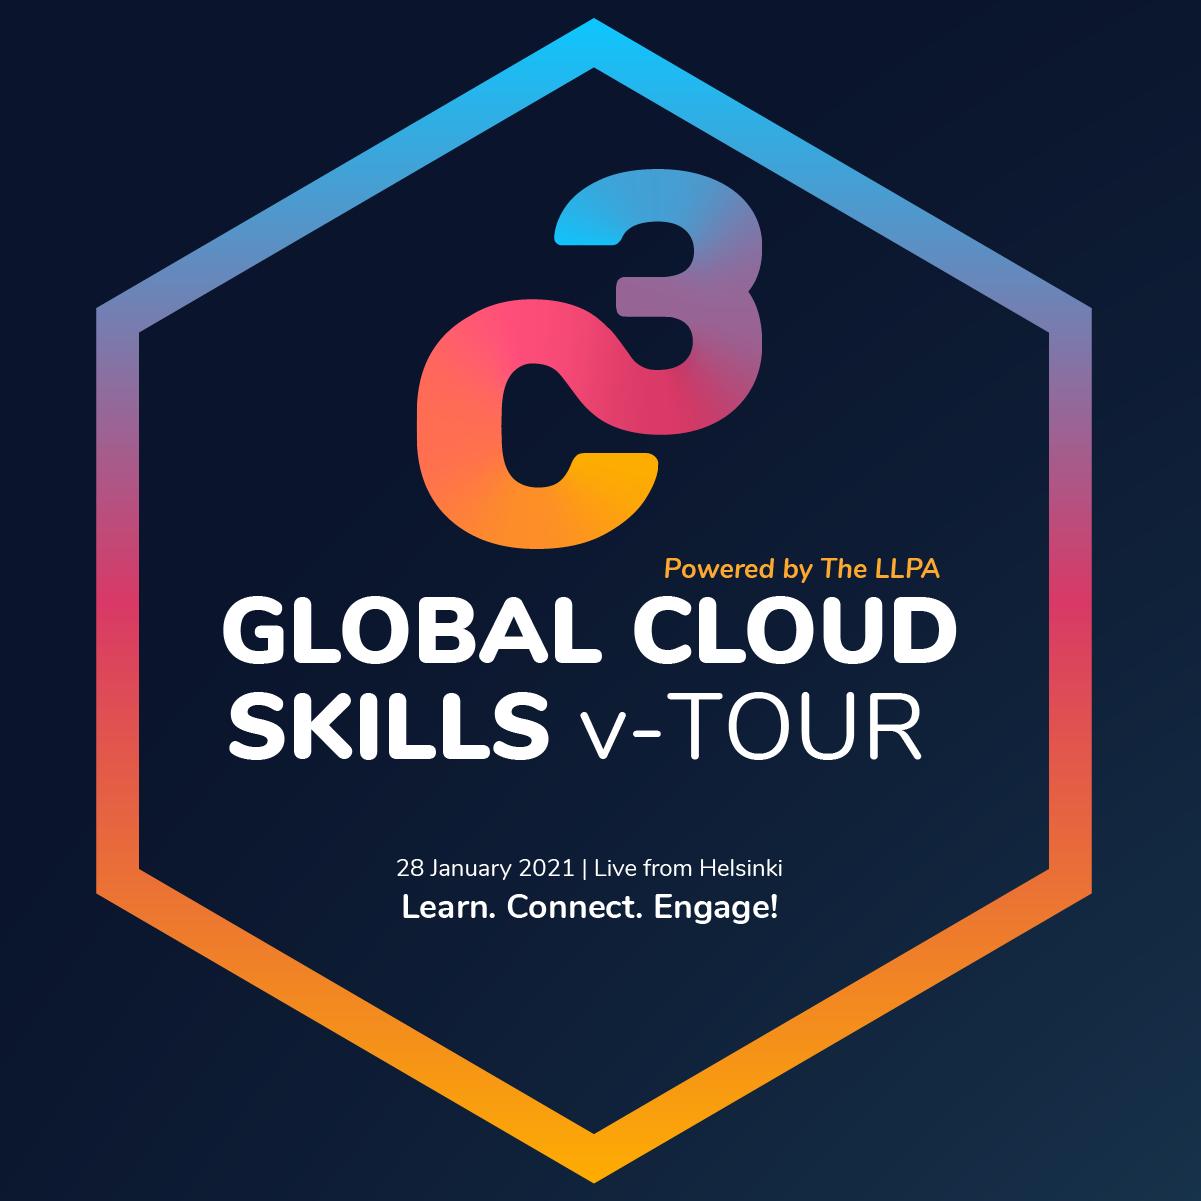 C3 Cloud Skills Tour 2021